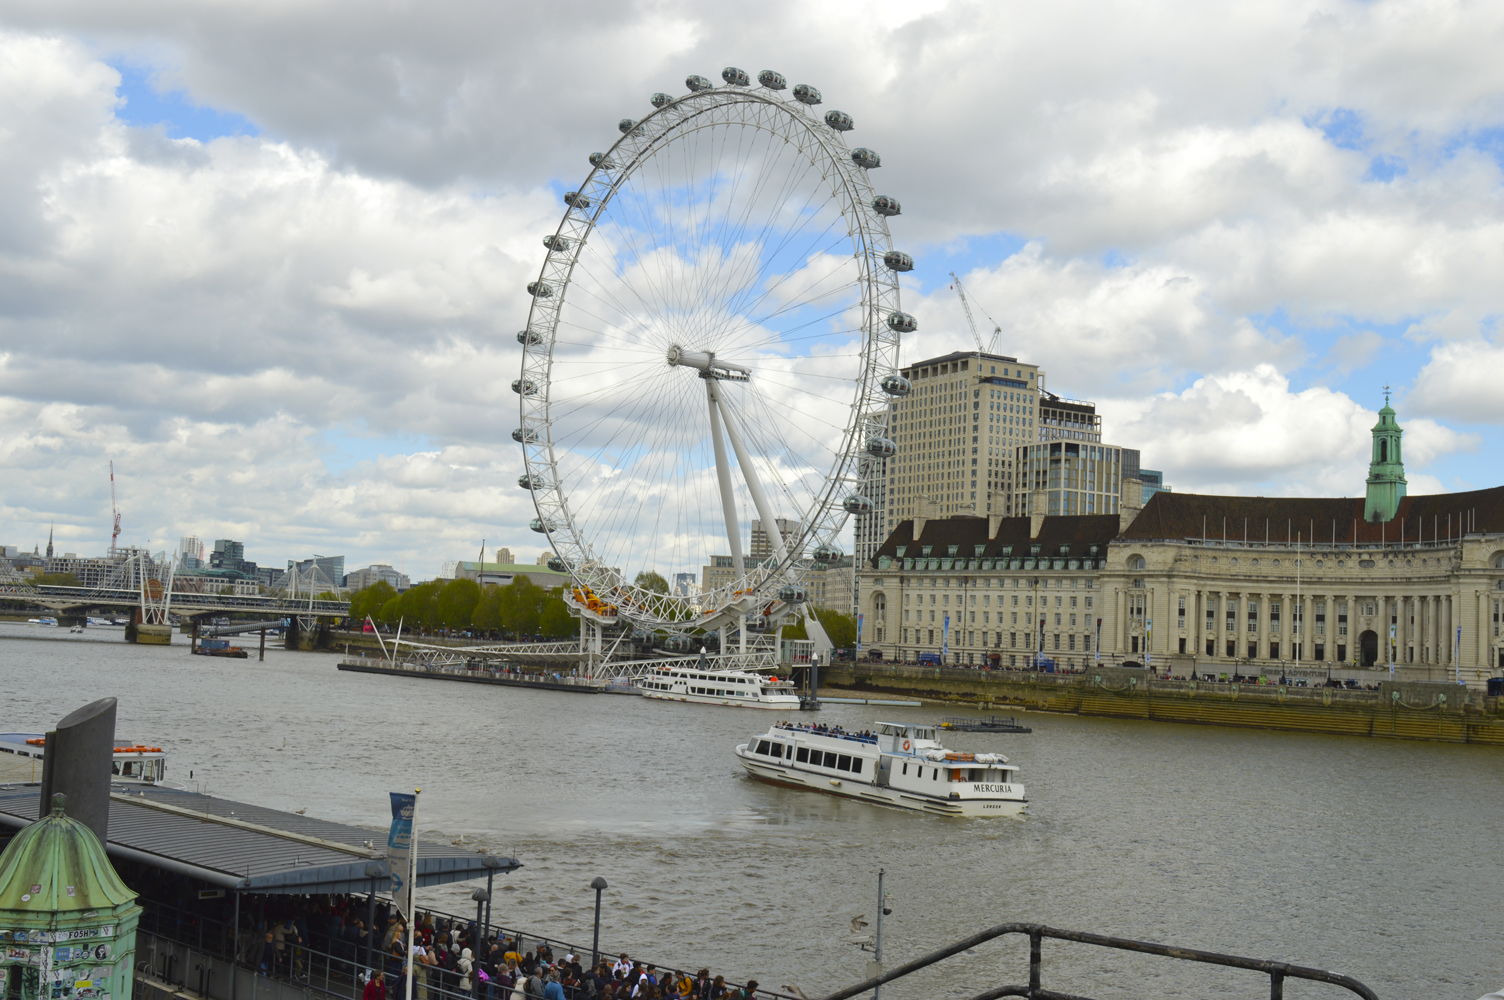 112 London Eye. 26.04.2019